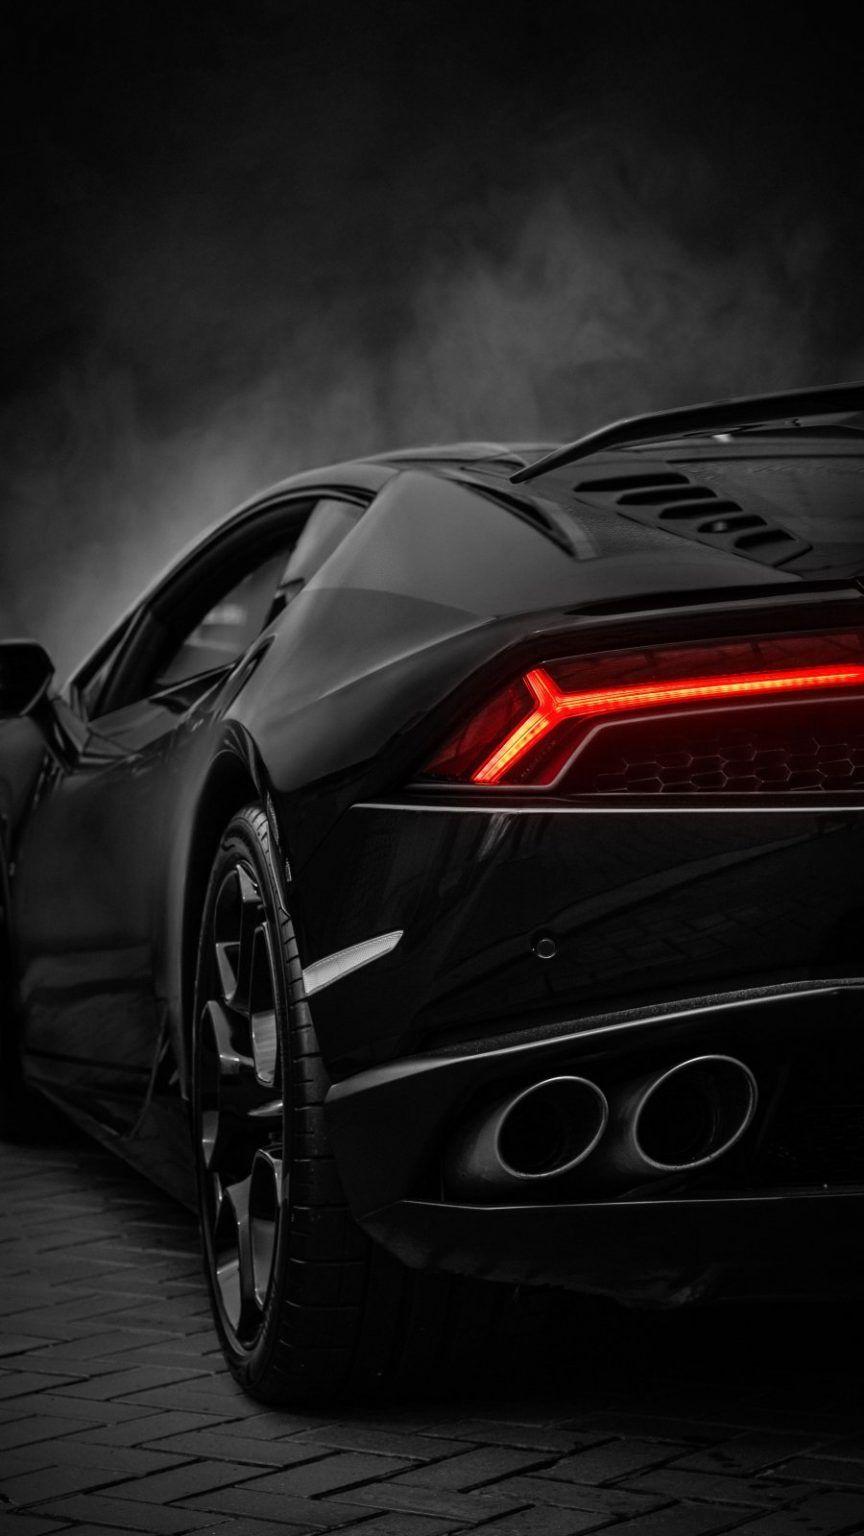 Find out what factors affect your premium. Porsche Carrera 4s Iphone Wallpaper Iphone Wallpapers Iphone Wallpapers Car Iphone Wallpaper Super Cars Black Car Wallpaper